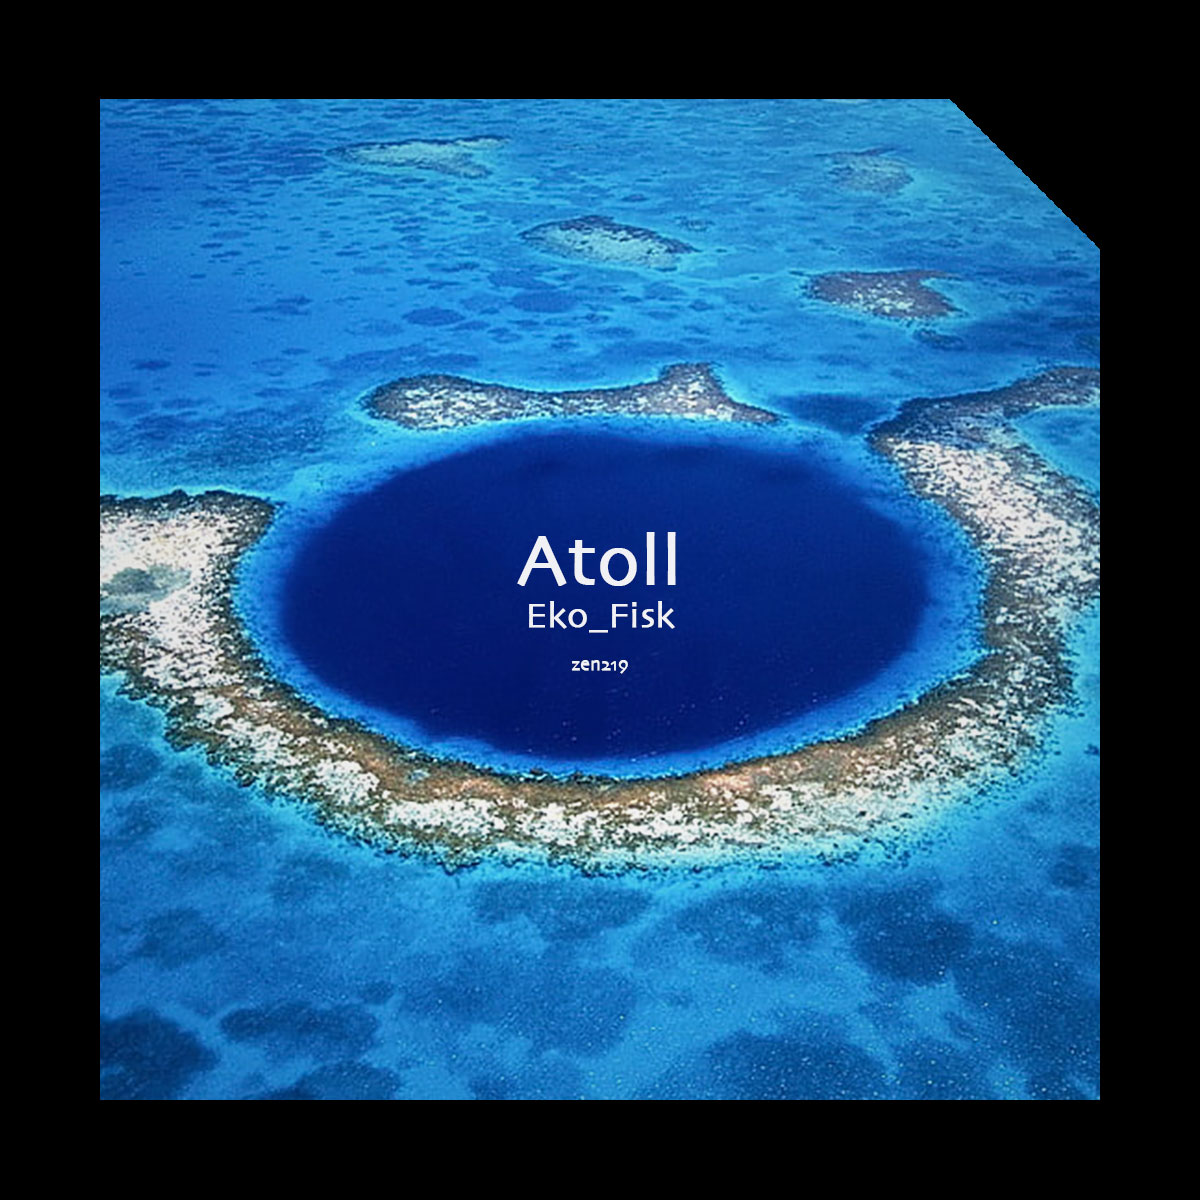 Eko_Fisk – Atoll